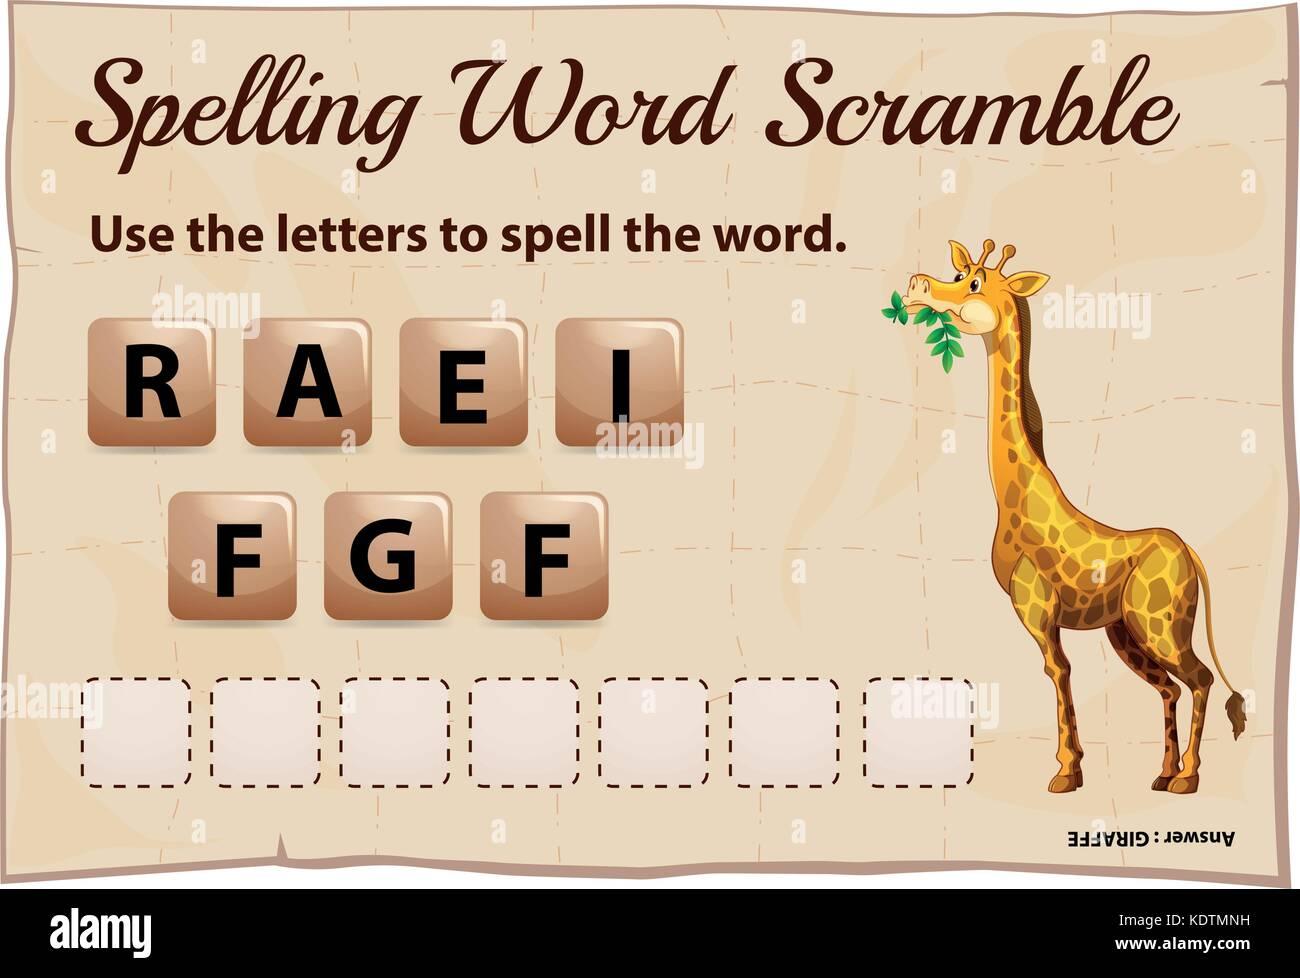 Spelling word scramble for word giraffe illustration - Stock Vector